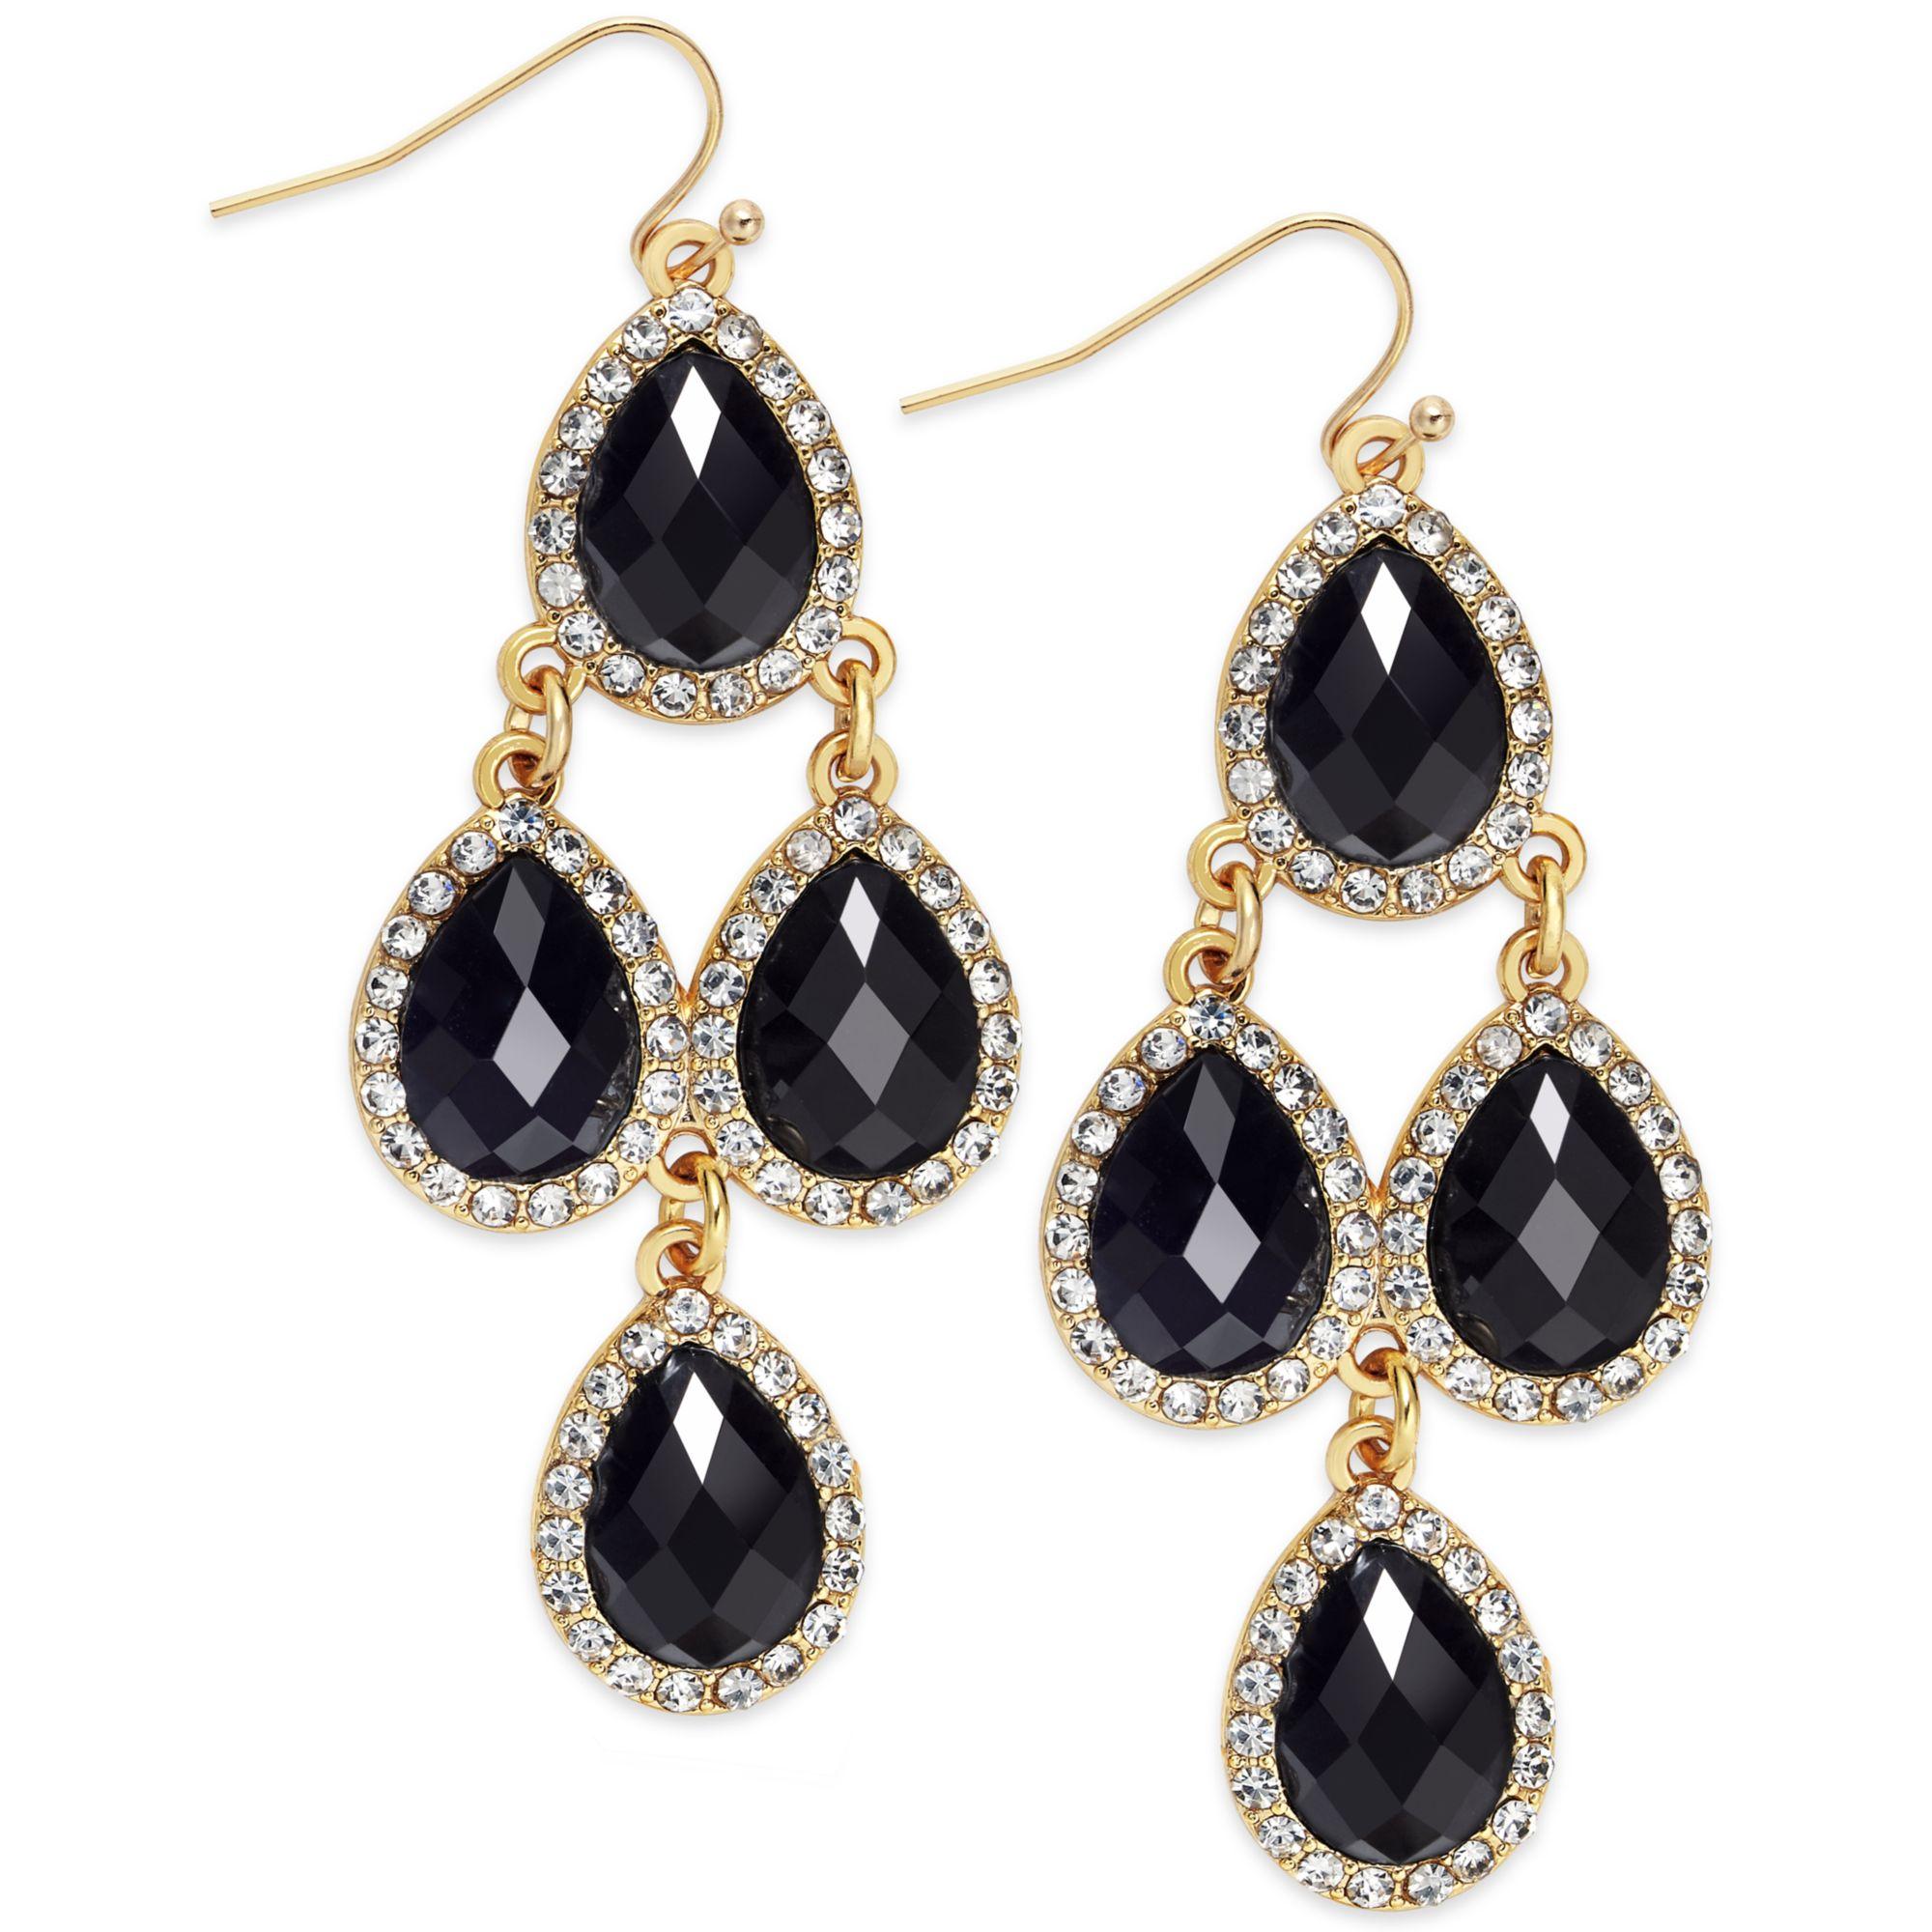 Inc International Concepts 14k Goldplated Black Pave Teardrop; 14k  Tricolor Gold Chandelier Earrings Ejer22816; 14k Gold